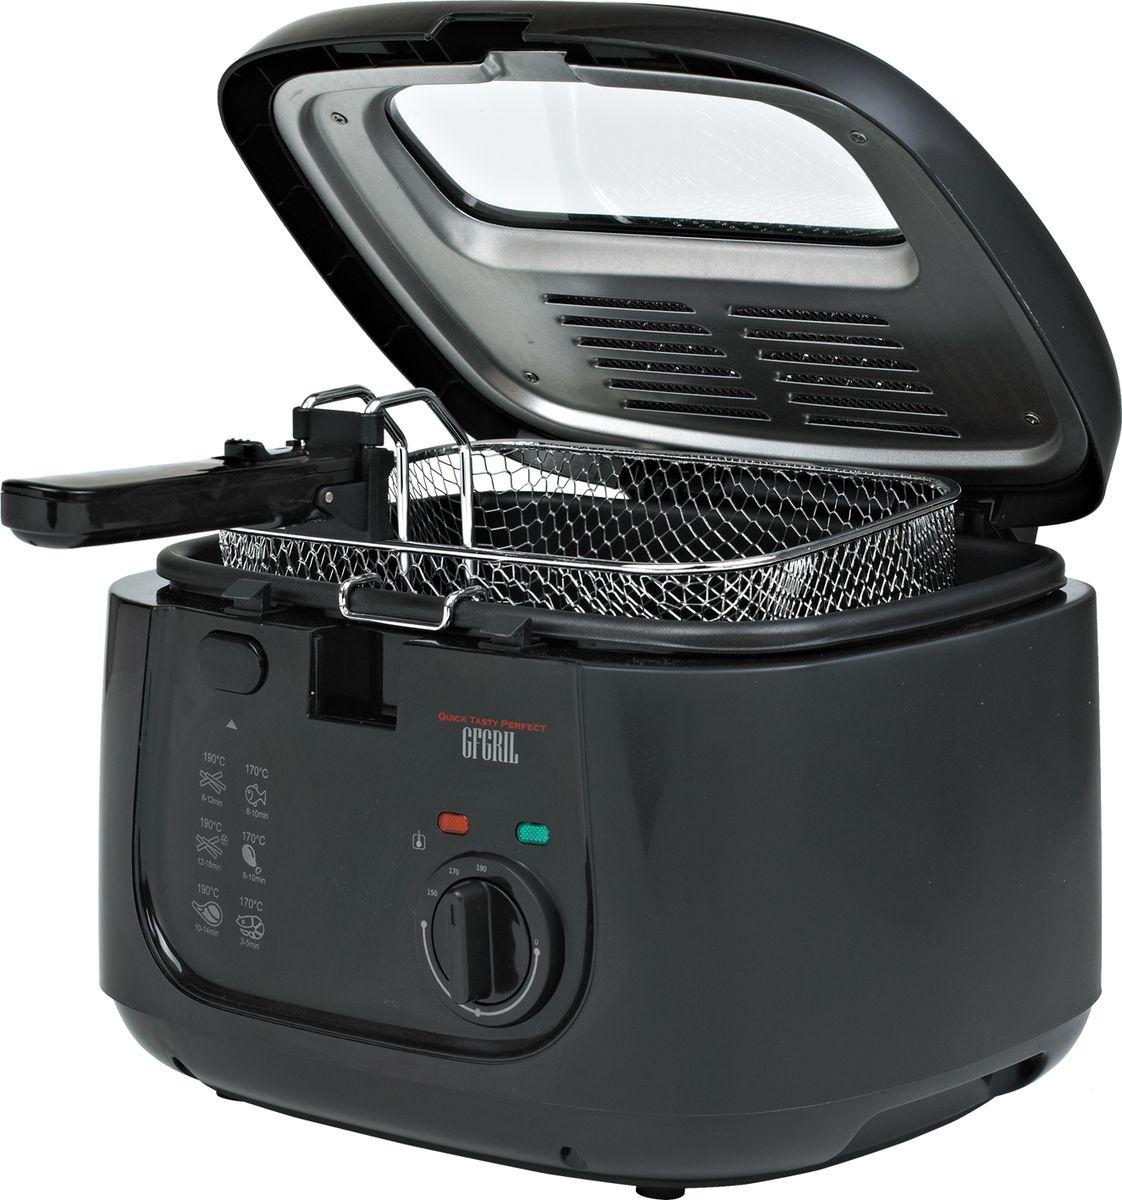 Gfgril GFF-05 Compact ����������